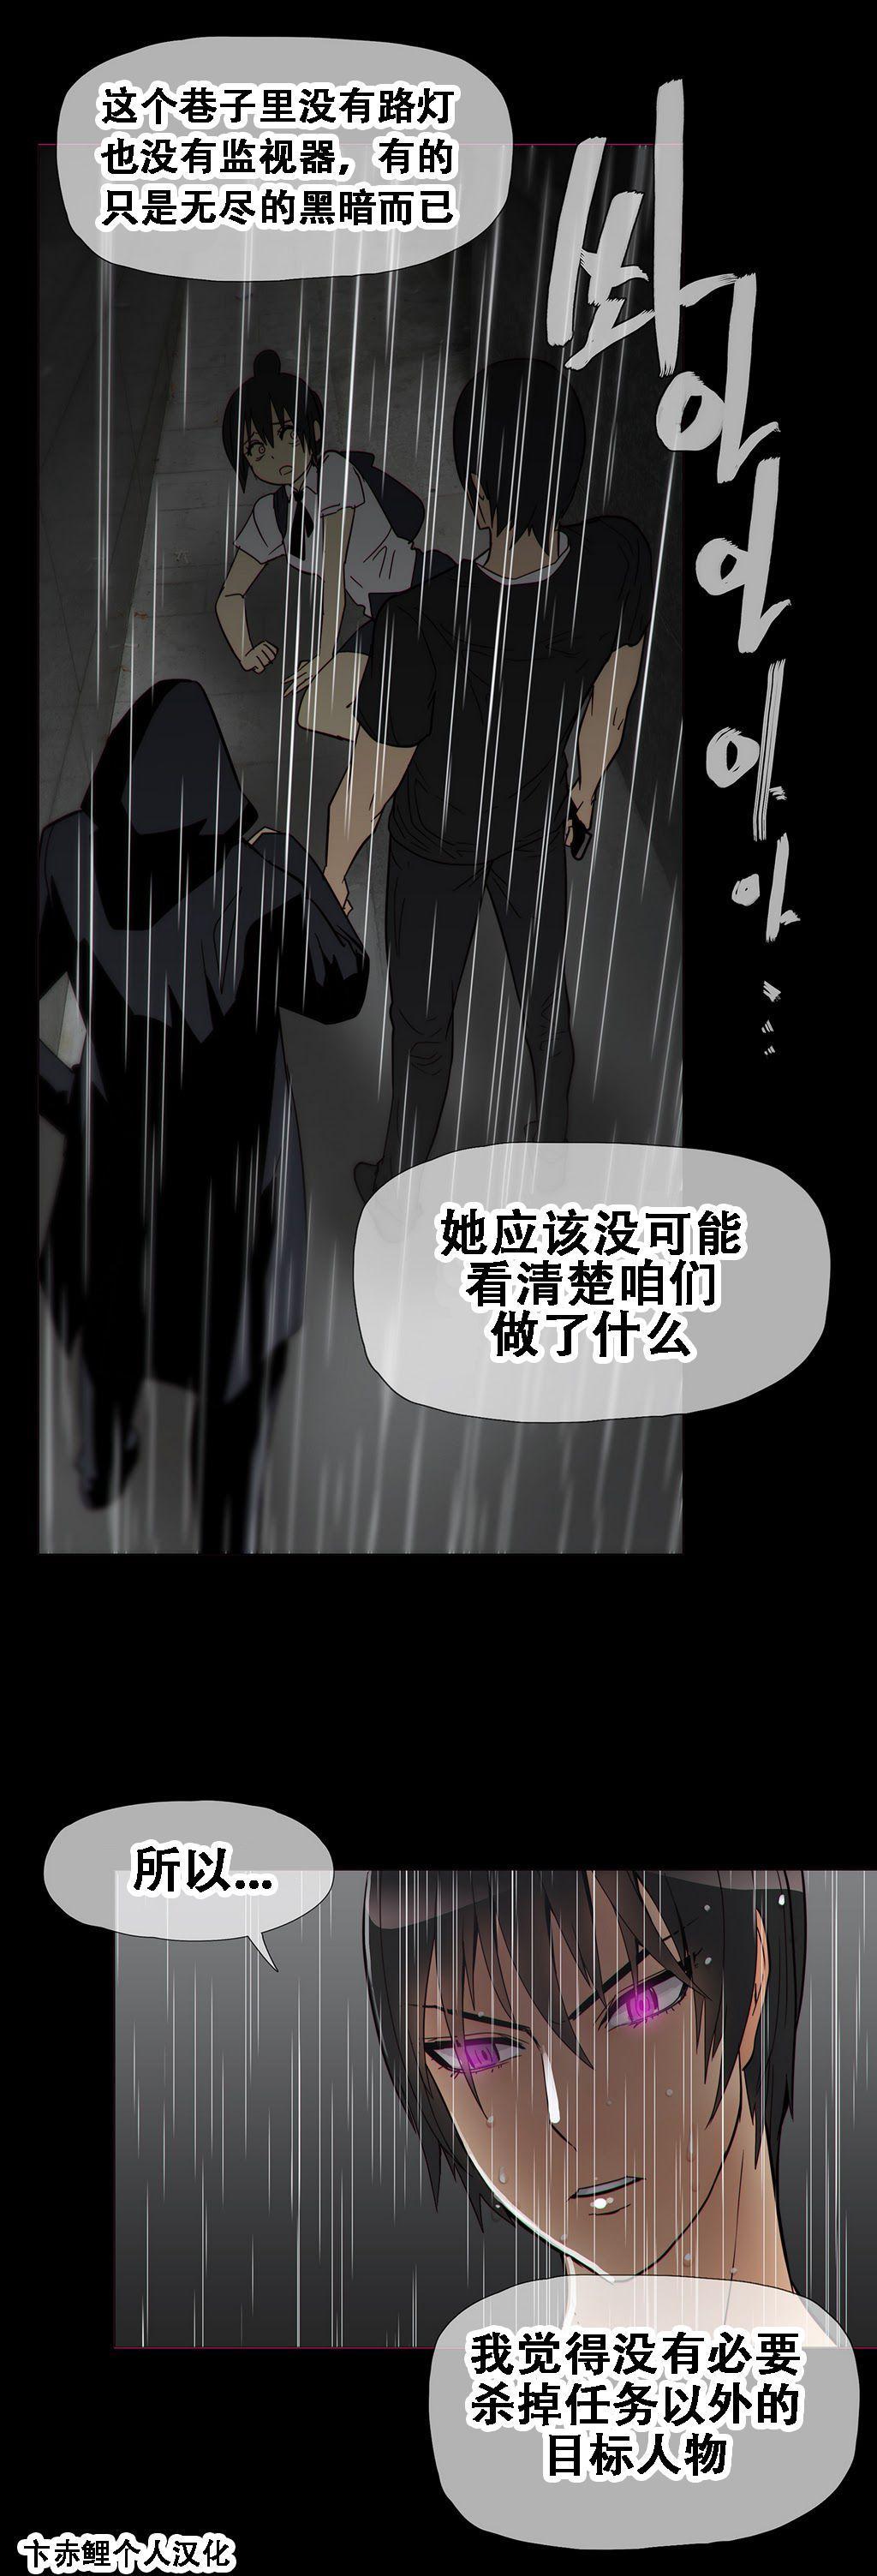 HouseHold Affairs 【卞赤鲤个人汉化】1~33话(持续更新中) 333